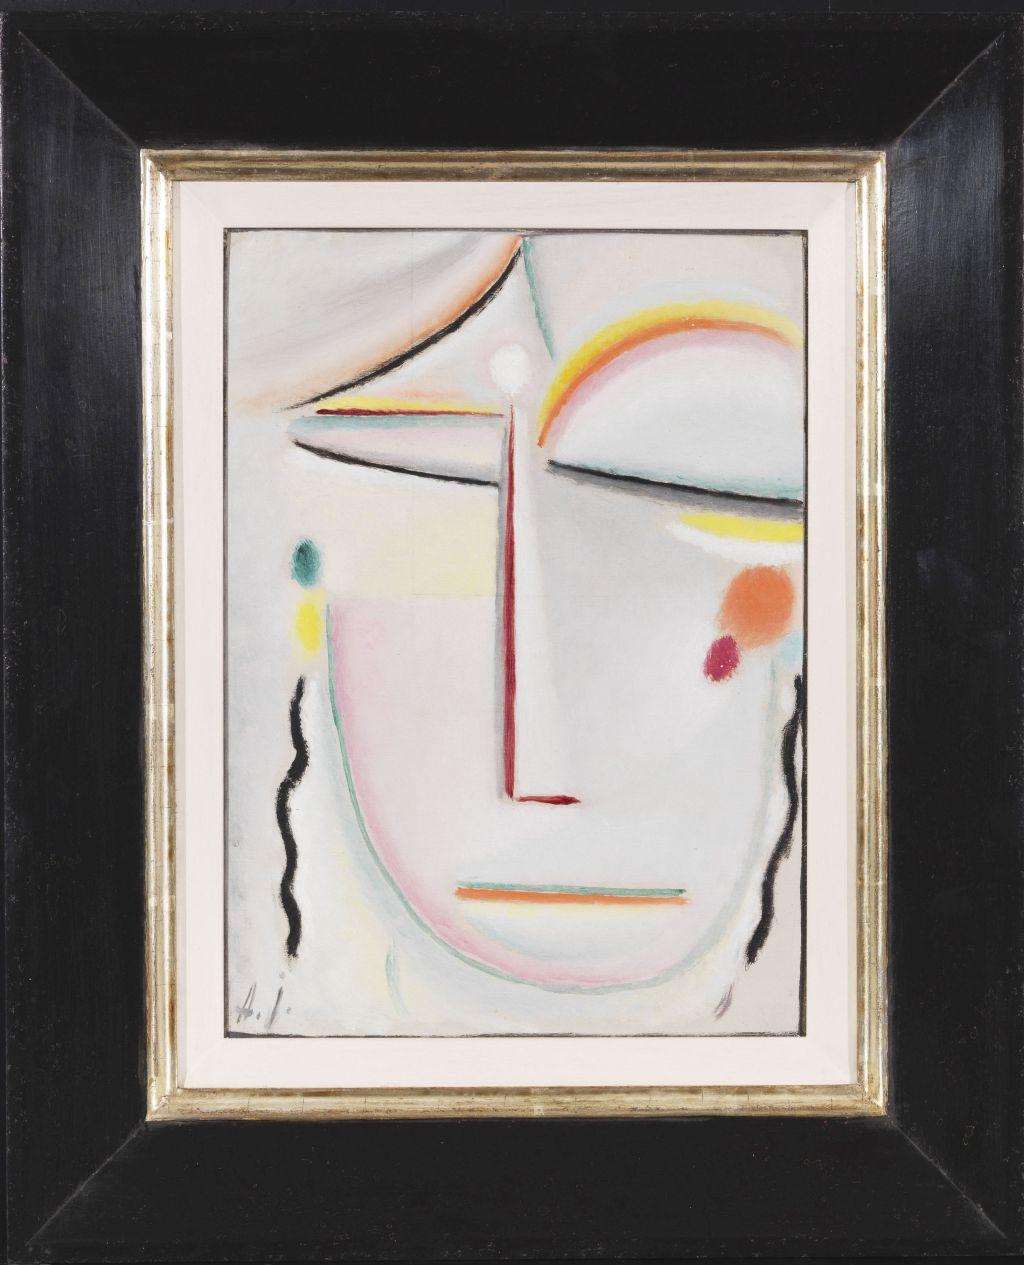 Alexej von Jawlensky - Abstrakter Kopf: Erleuchtung II - Frame image